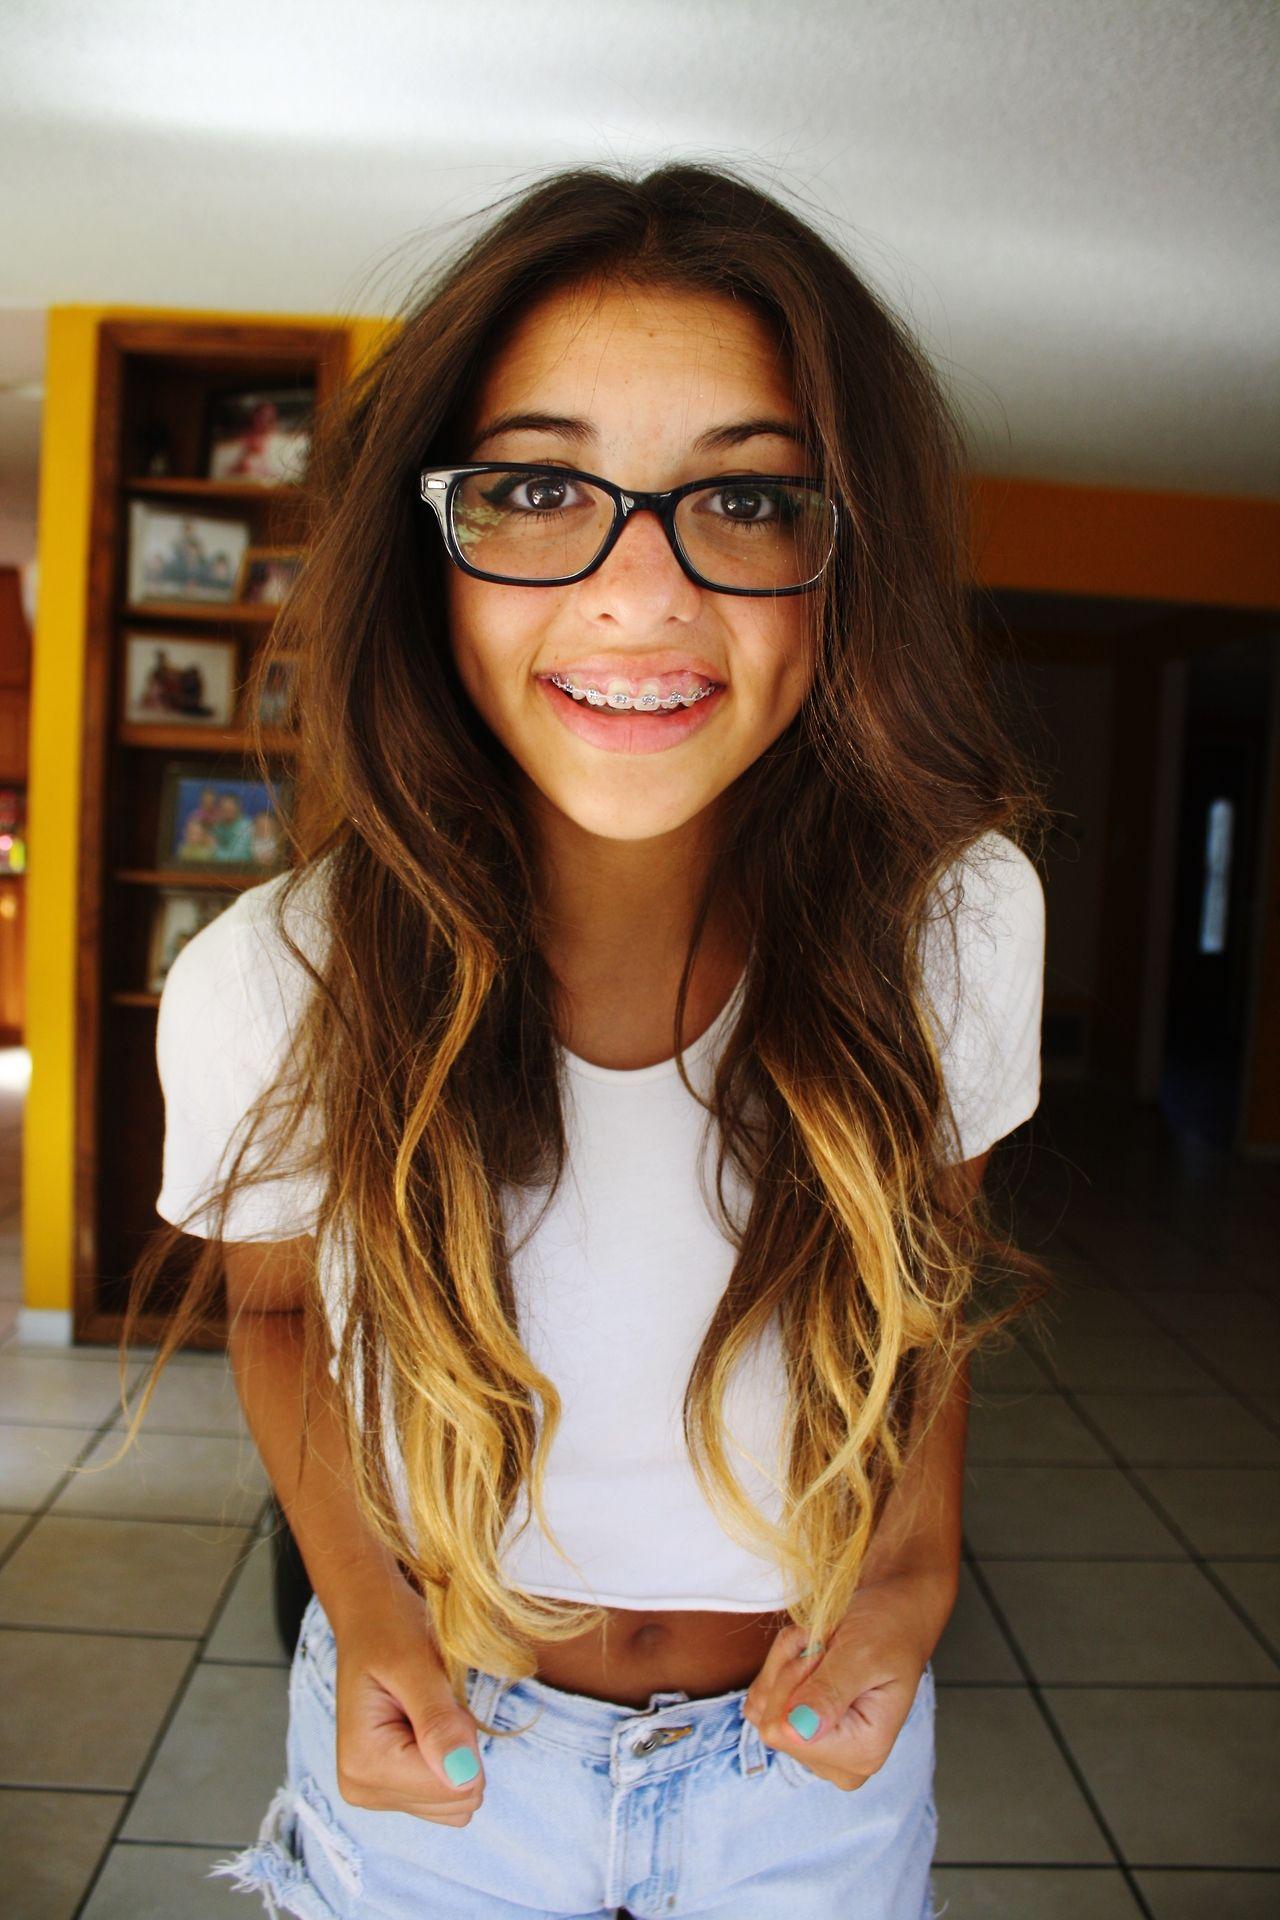 Teen babe Tatiana Kush looks so cute and innocent in glasses № 39384 загрузить